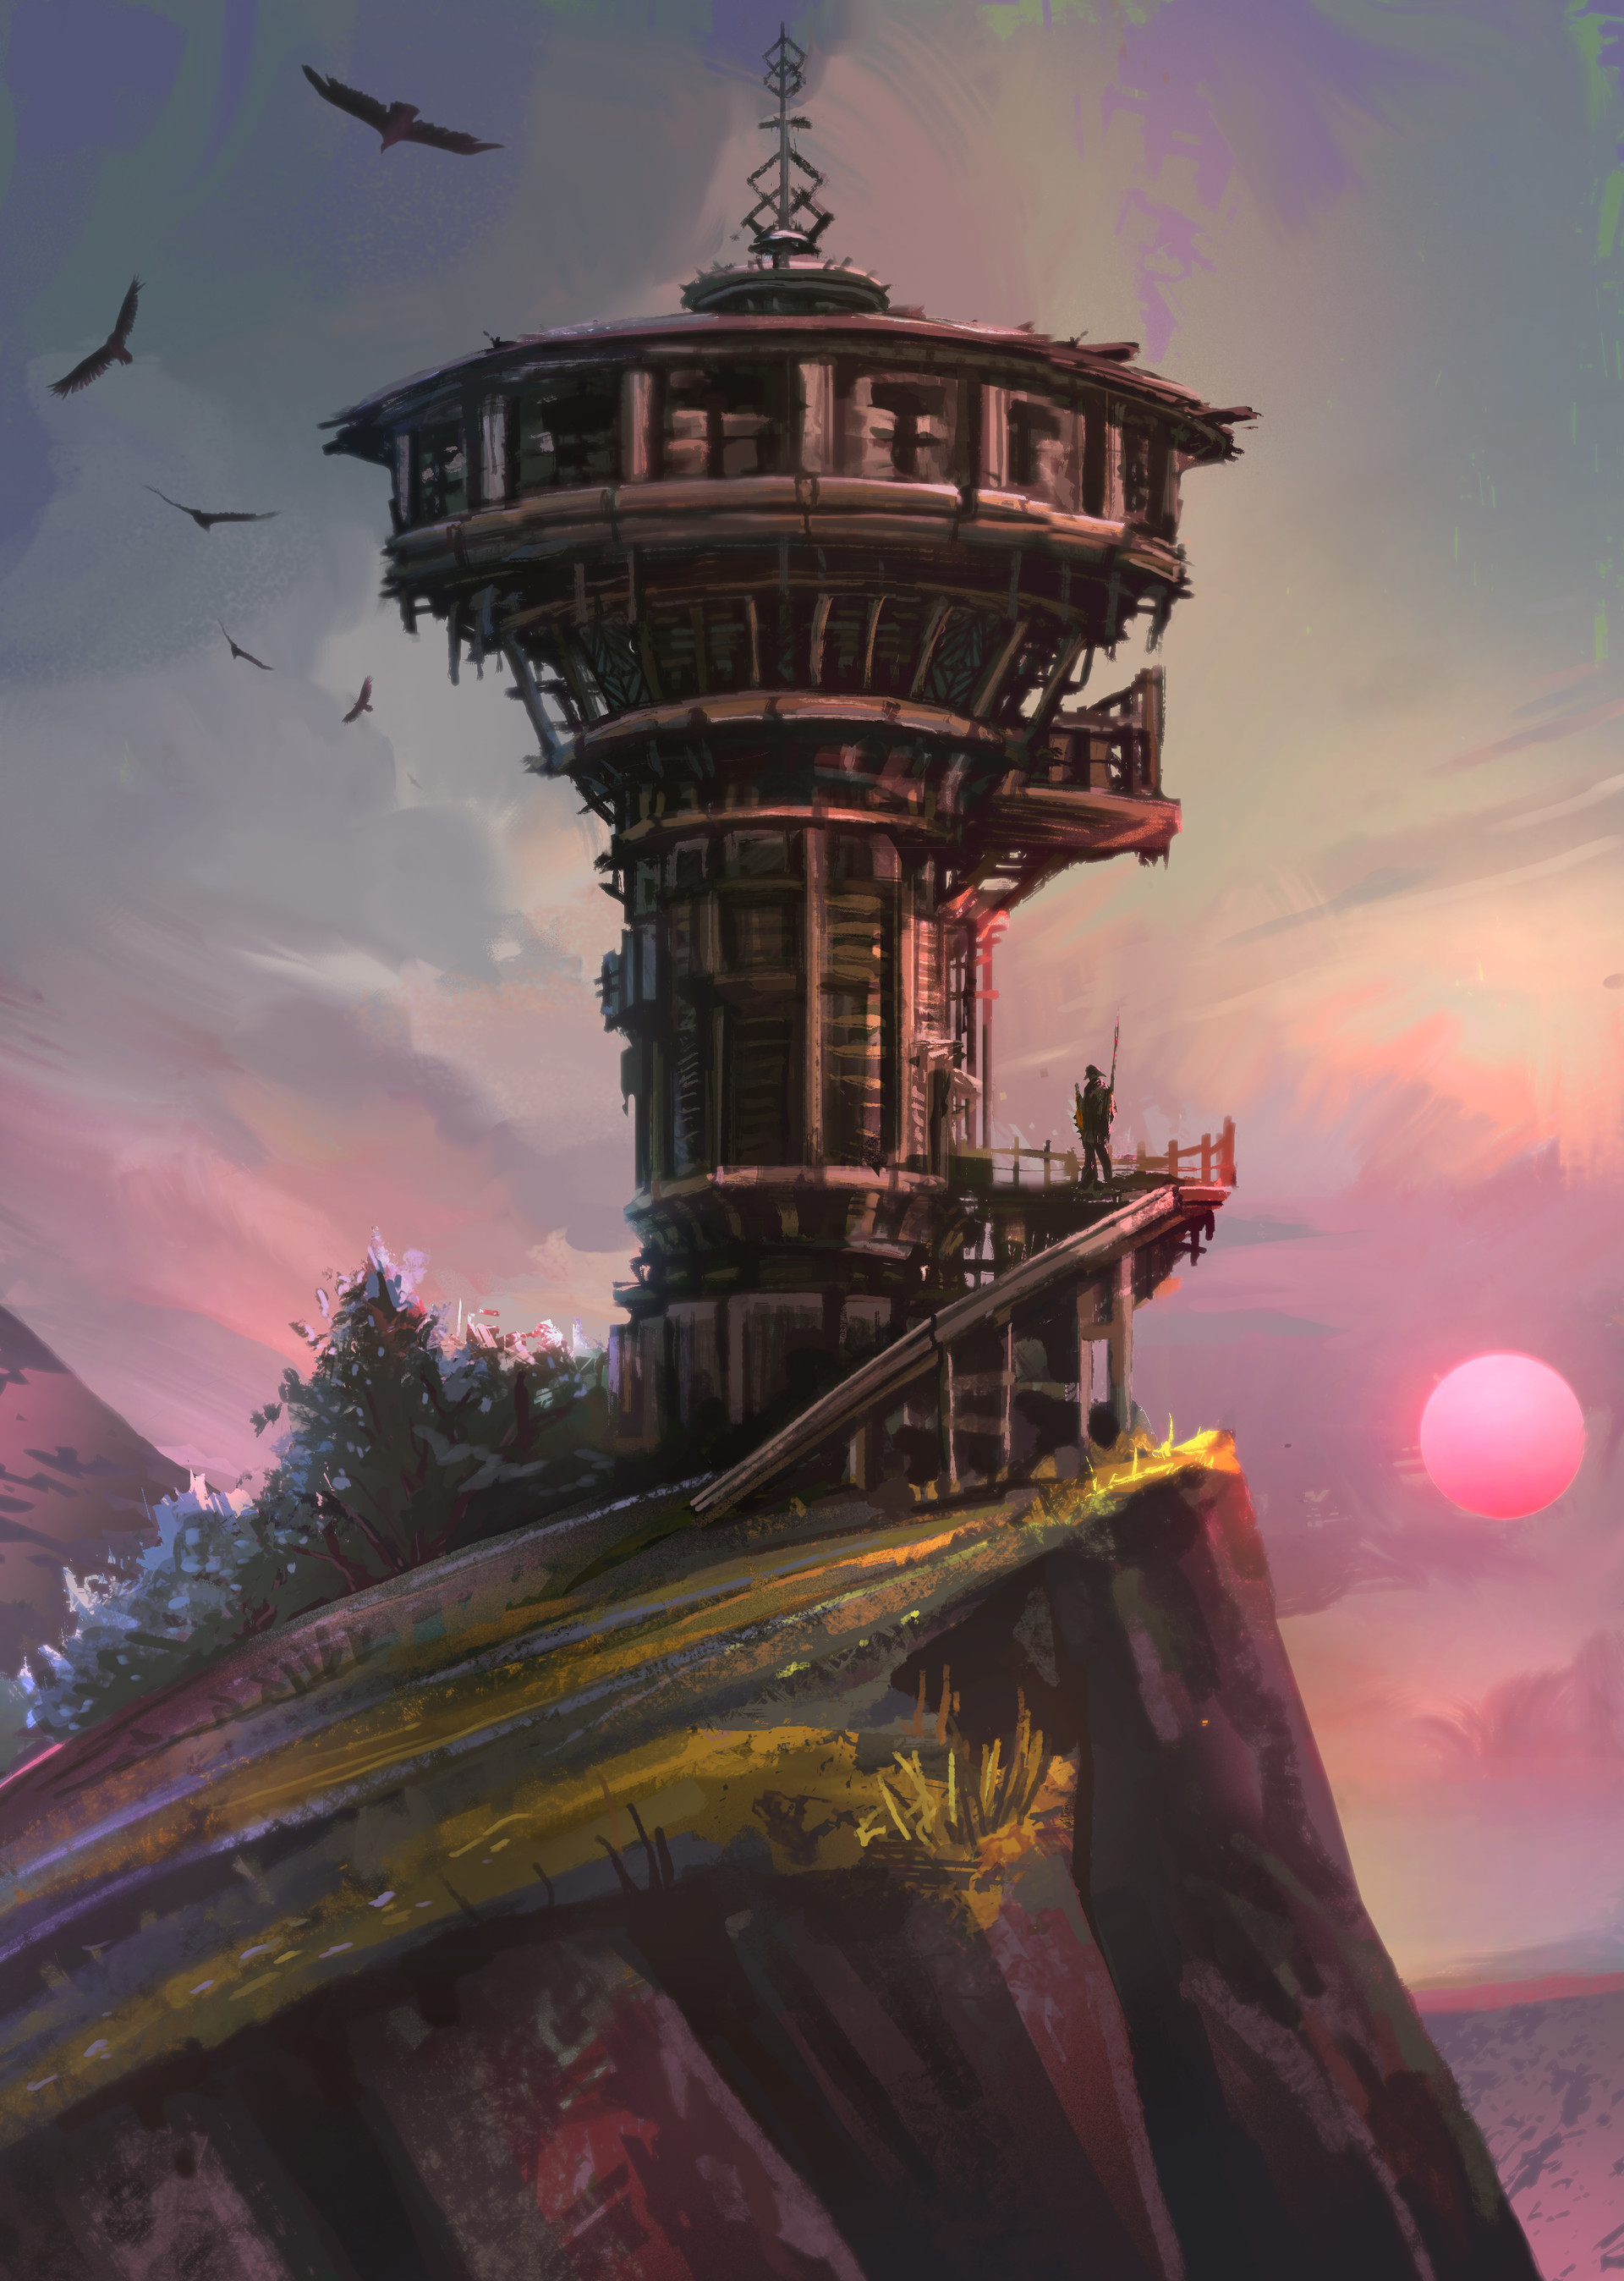 Weston t jones trinn tower